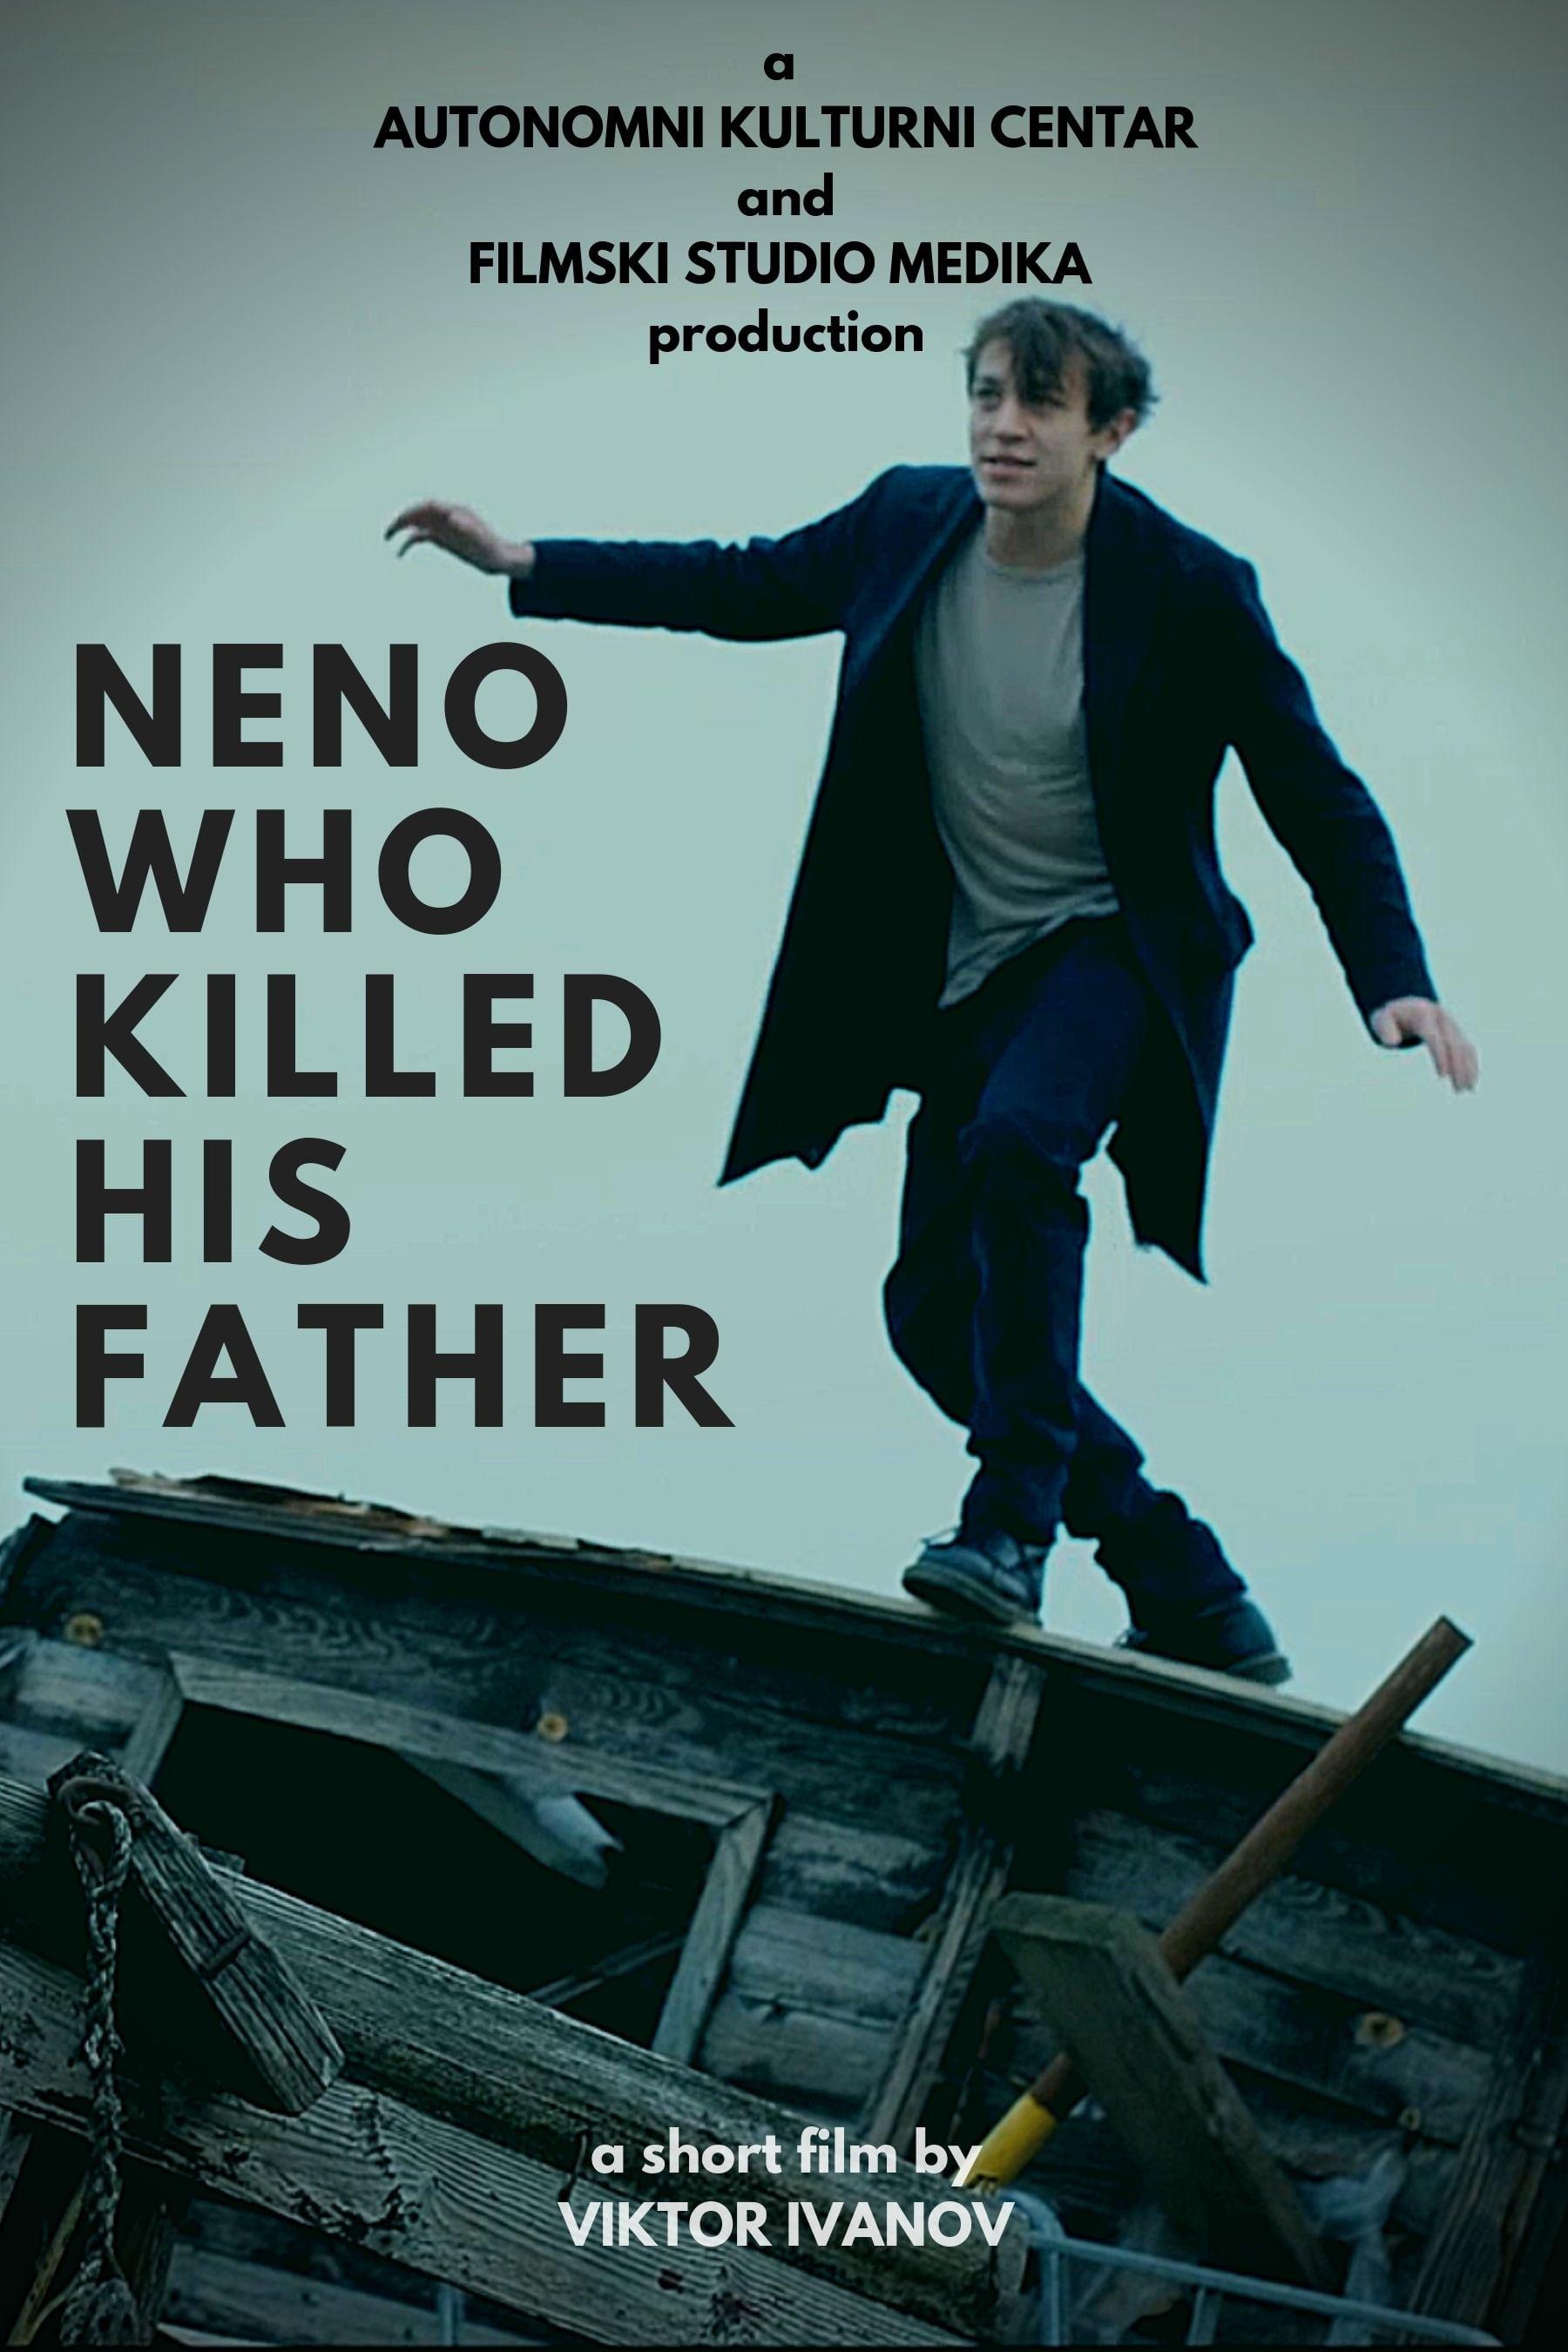 Neno Who Killed His Father